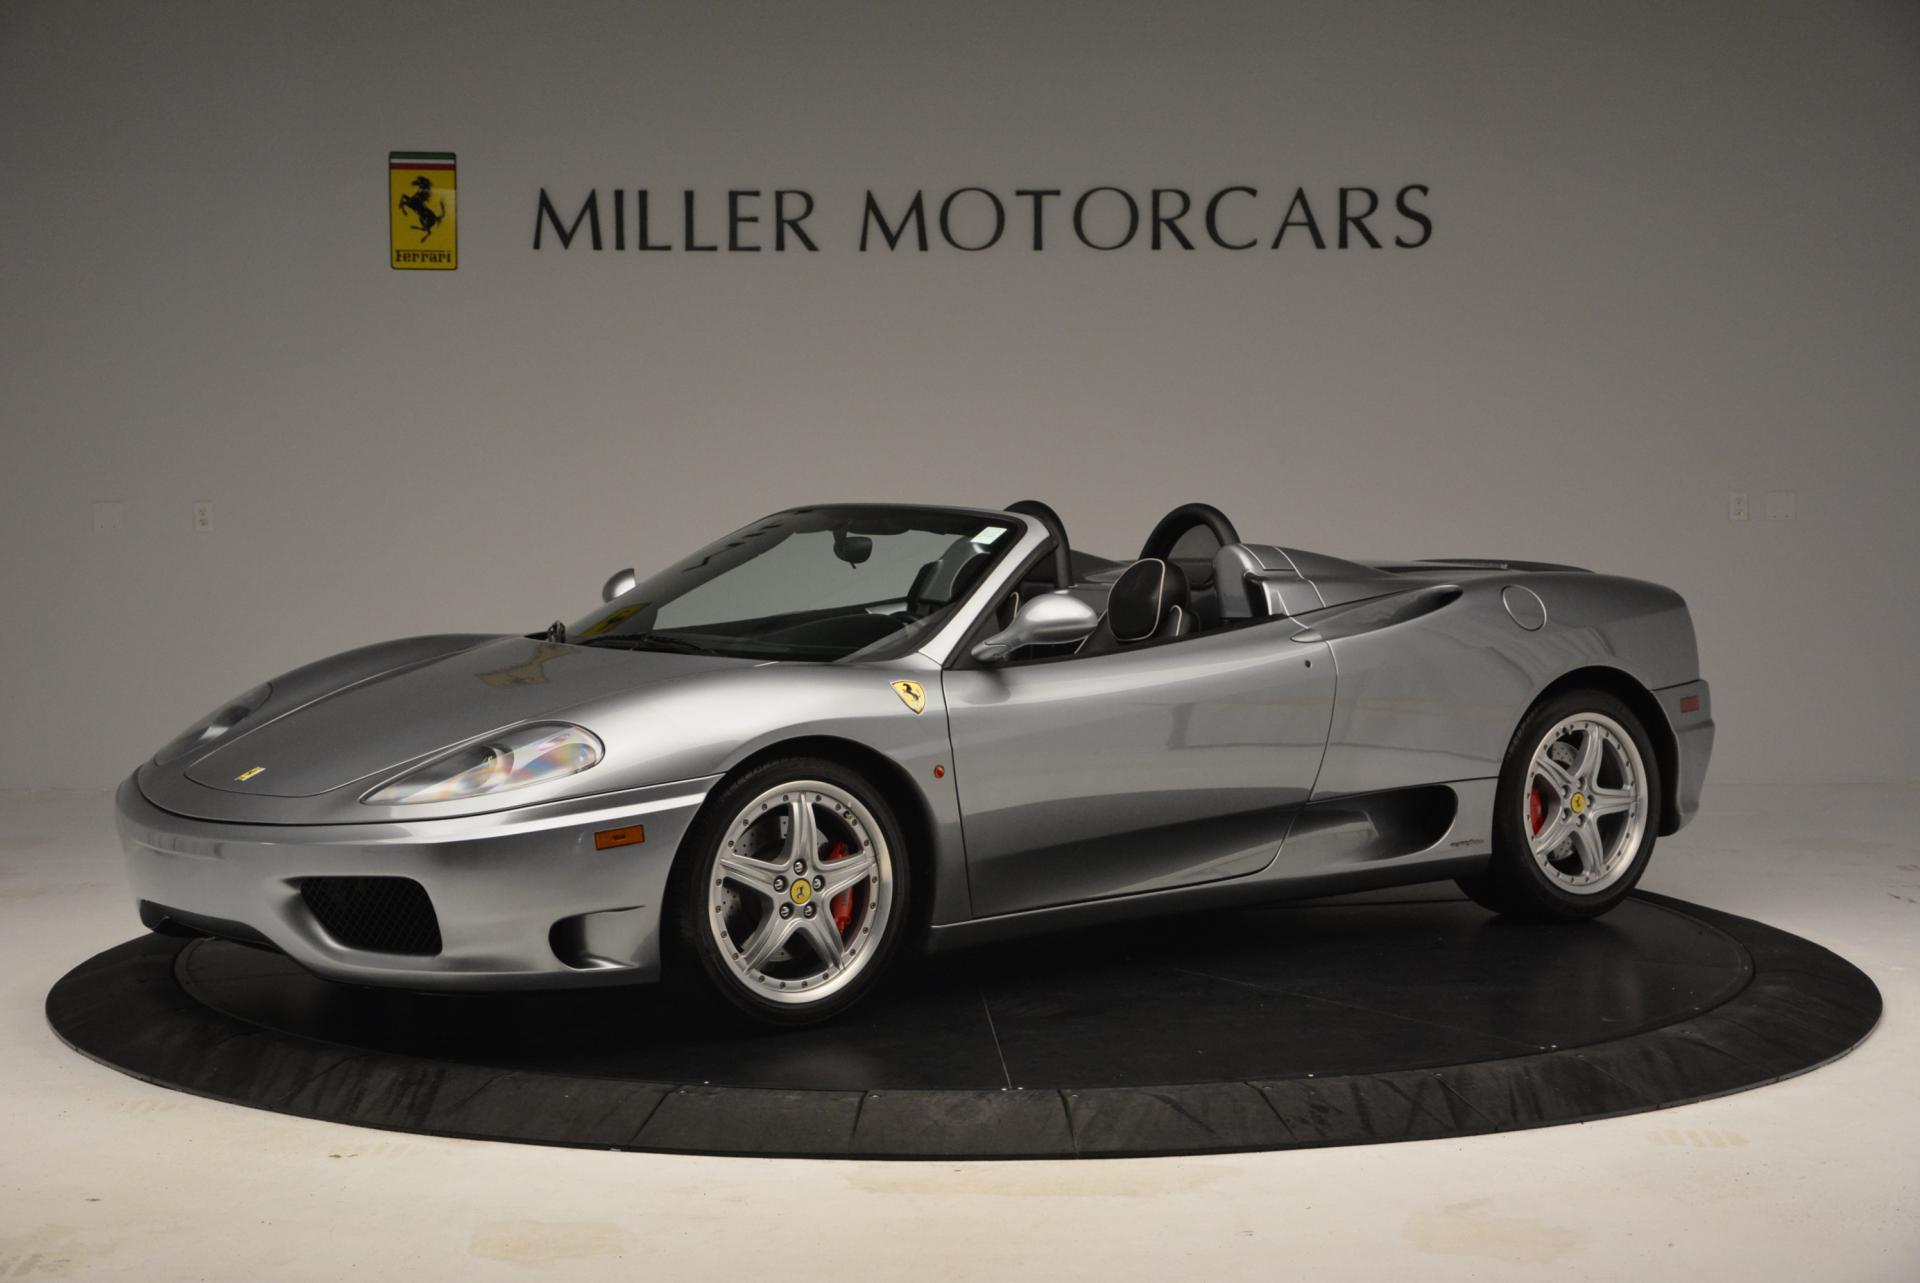 Used 2004 Ferrari 360 Spider 6-Speed Manual  For Sale In Greenwich, CT. Alfa Romeo of Greenwich, 4317 138_p2